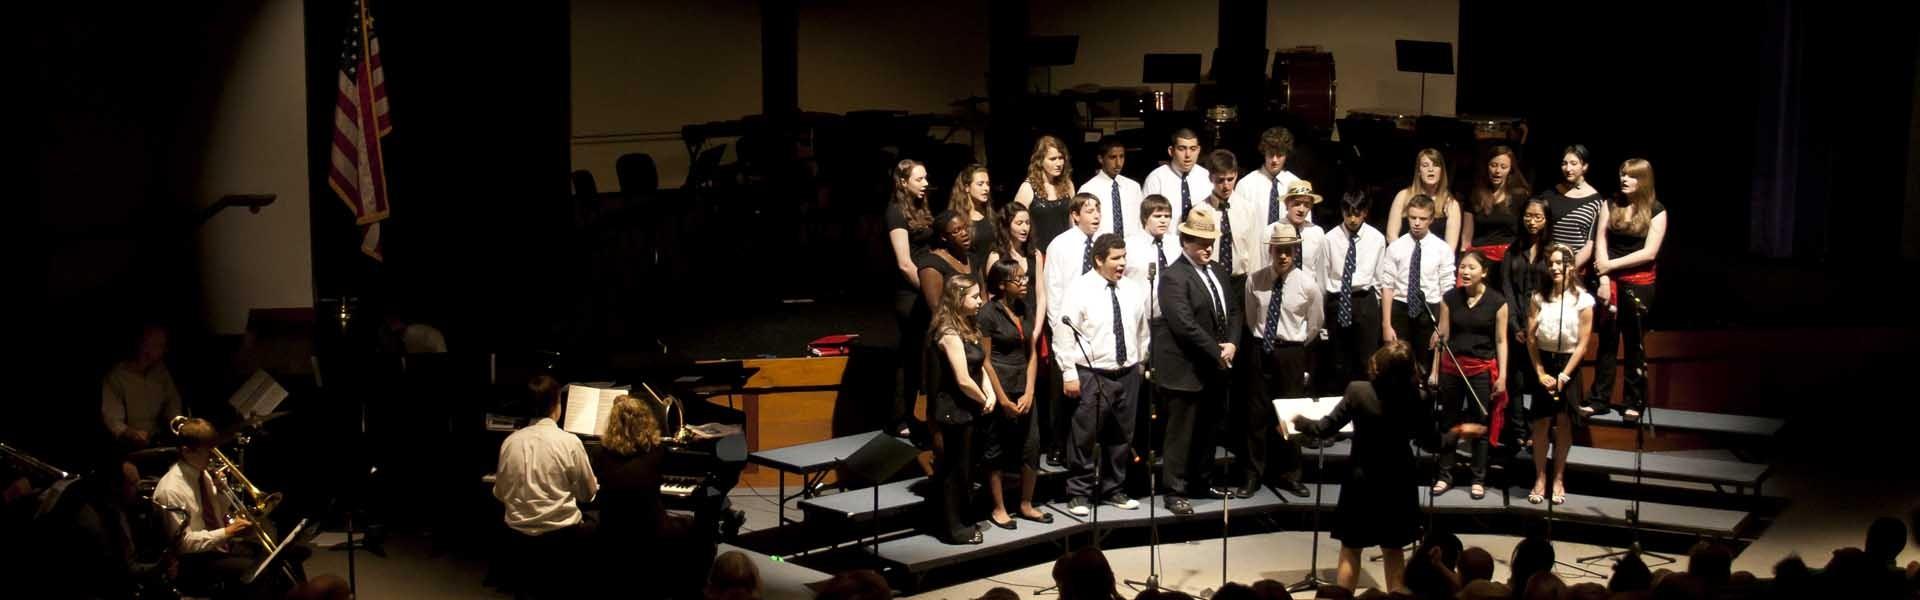 AllendaleColumbiaSchool-highschool-New-York-Chorus-Main-BAnner-2019